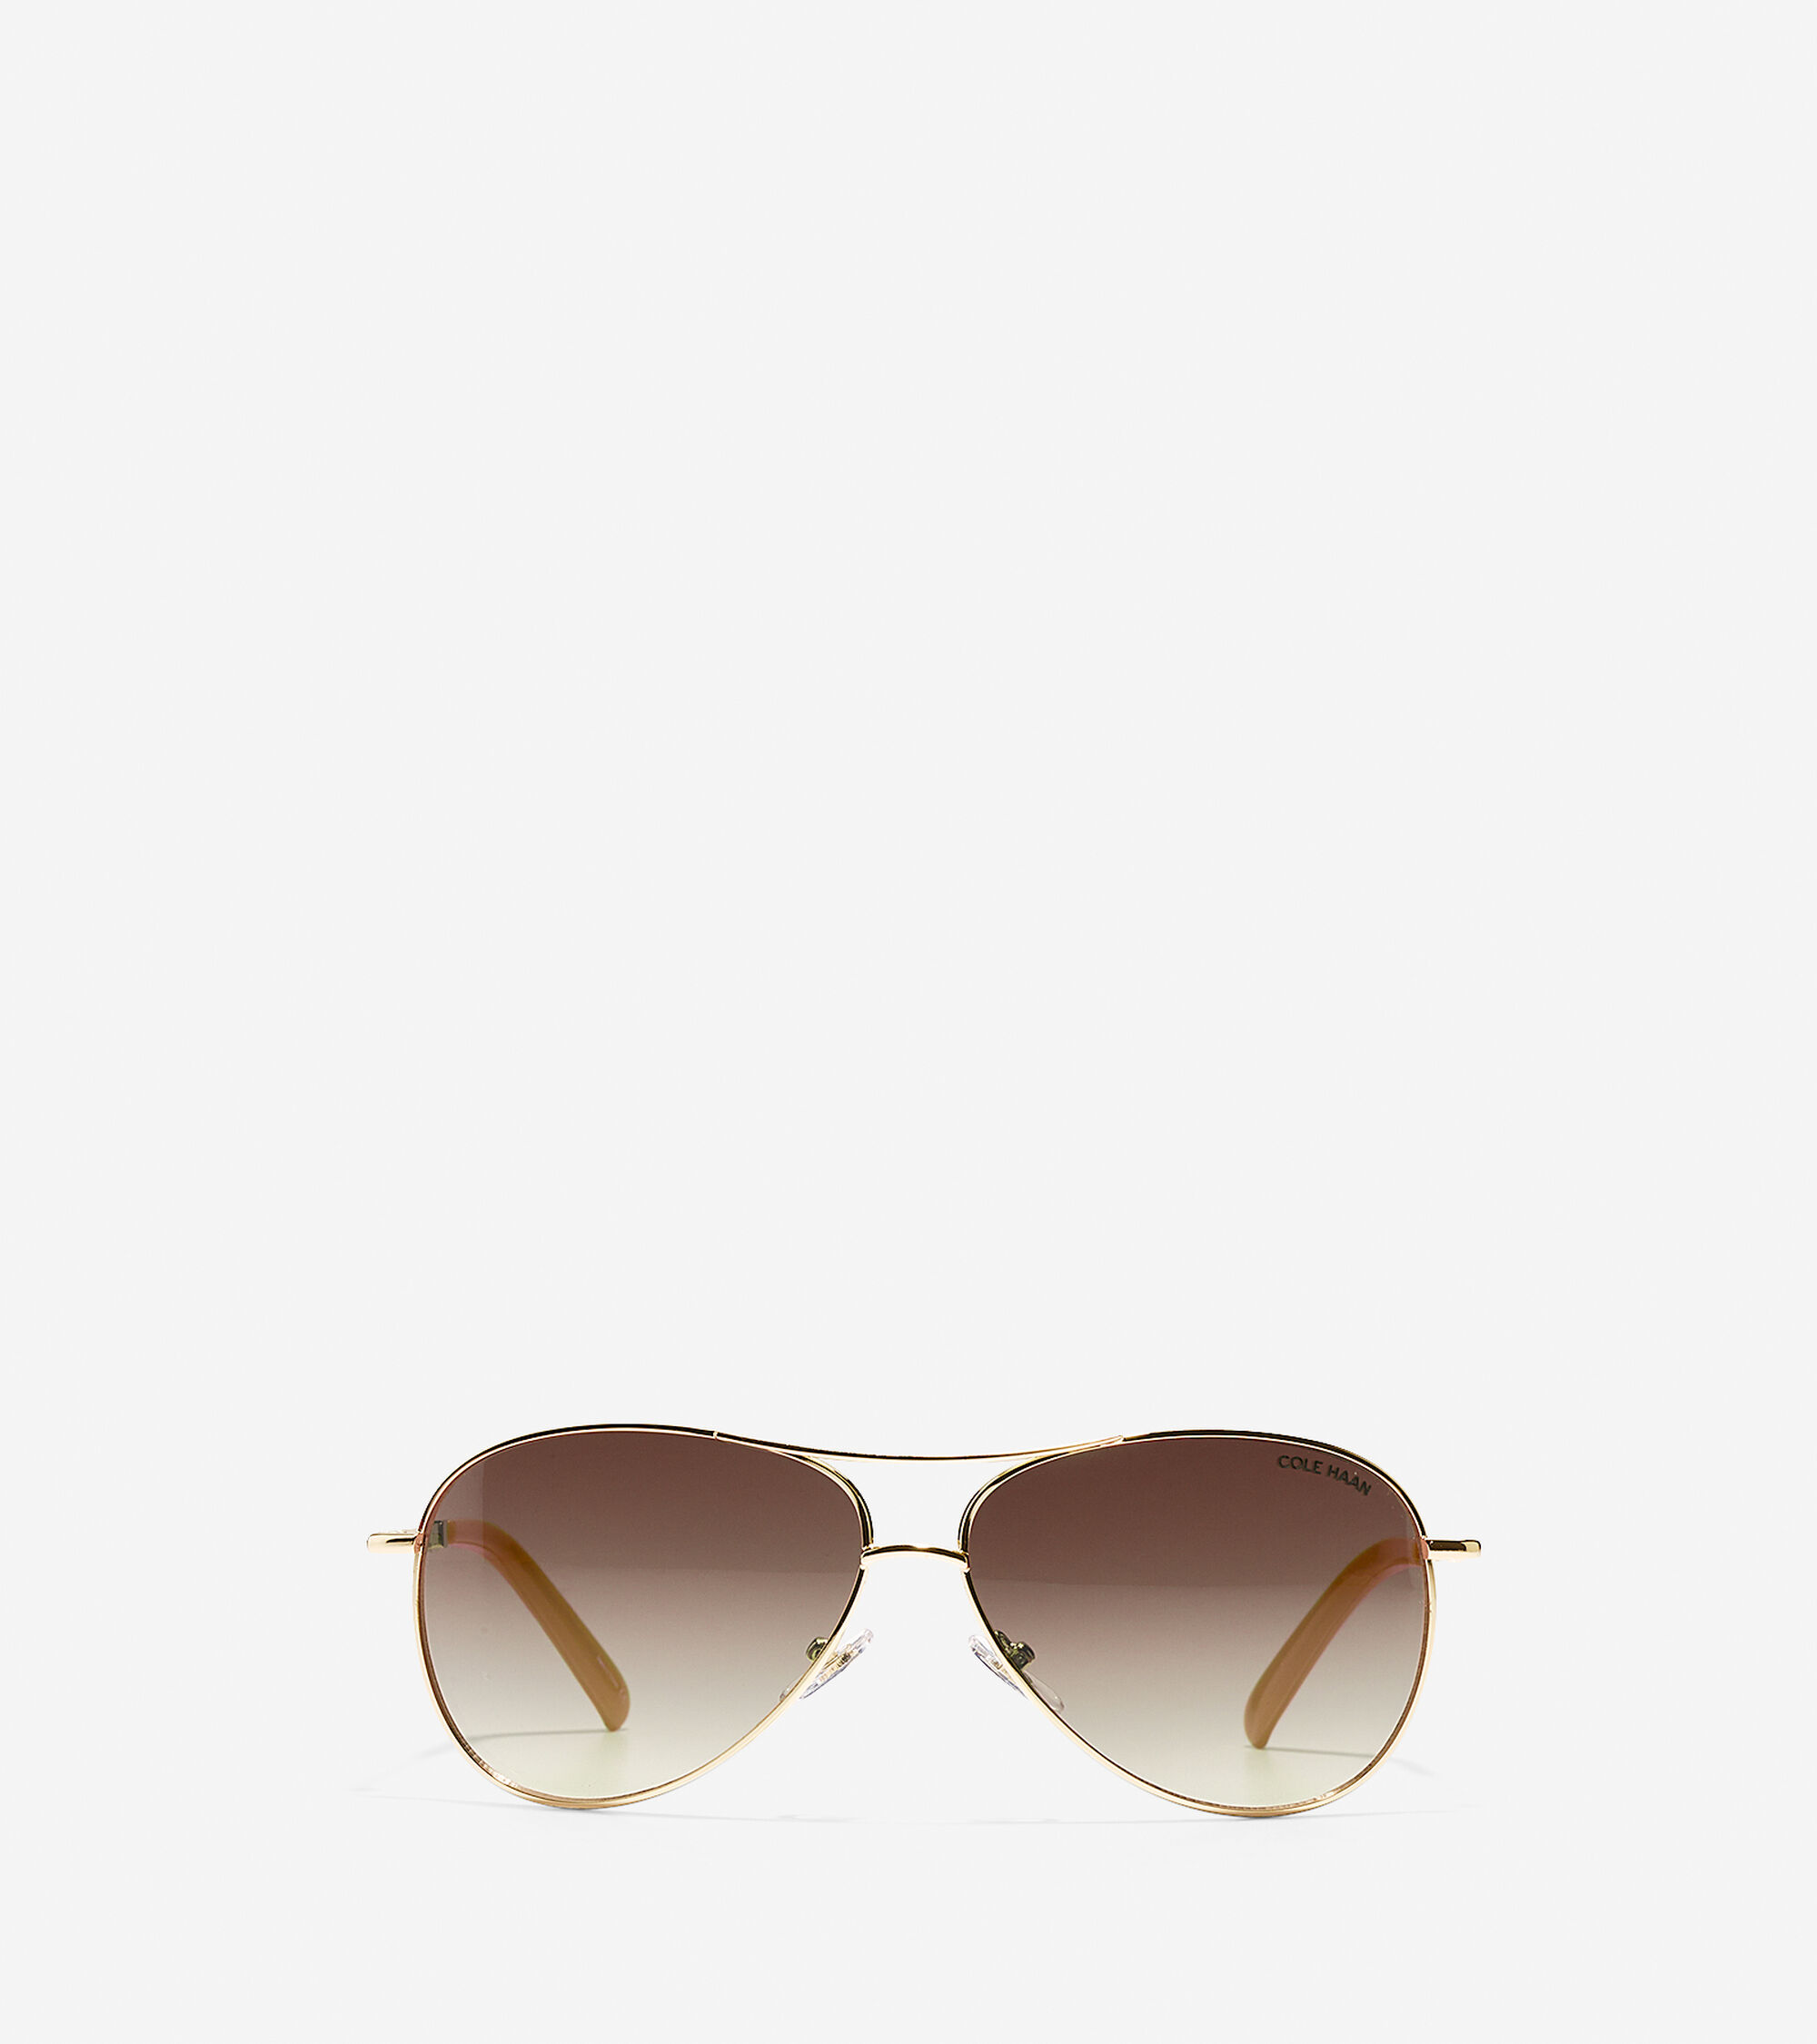 Accessories > Classic Metal Aviator Sunglasses